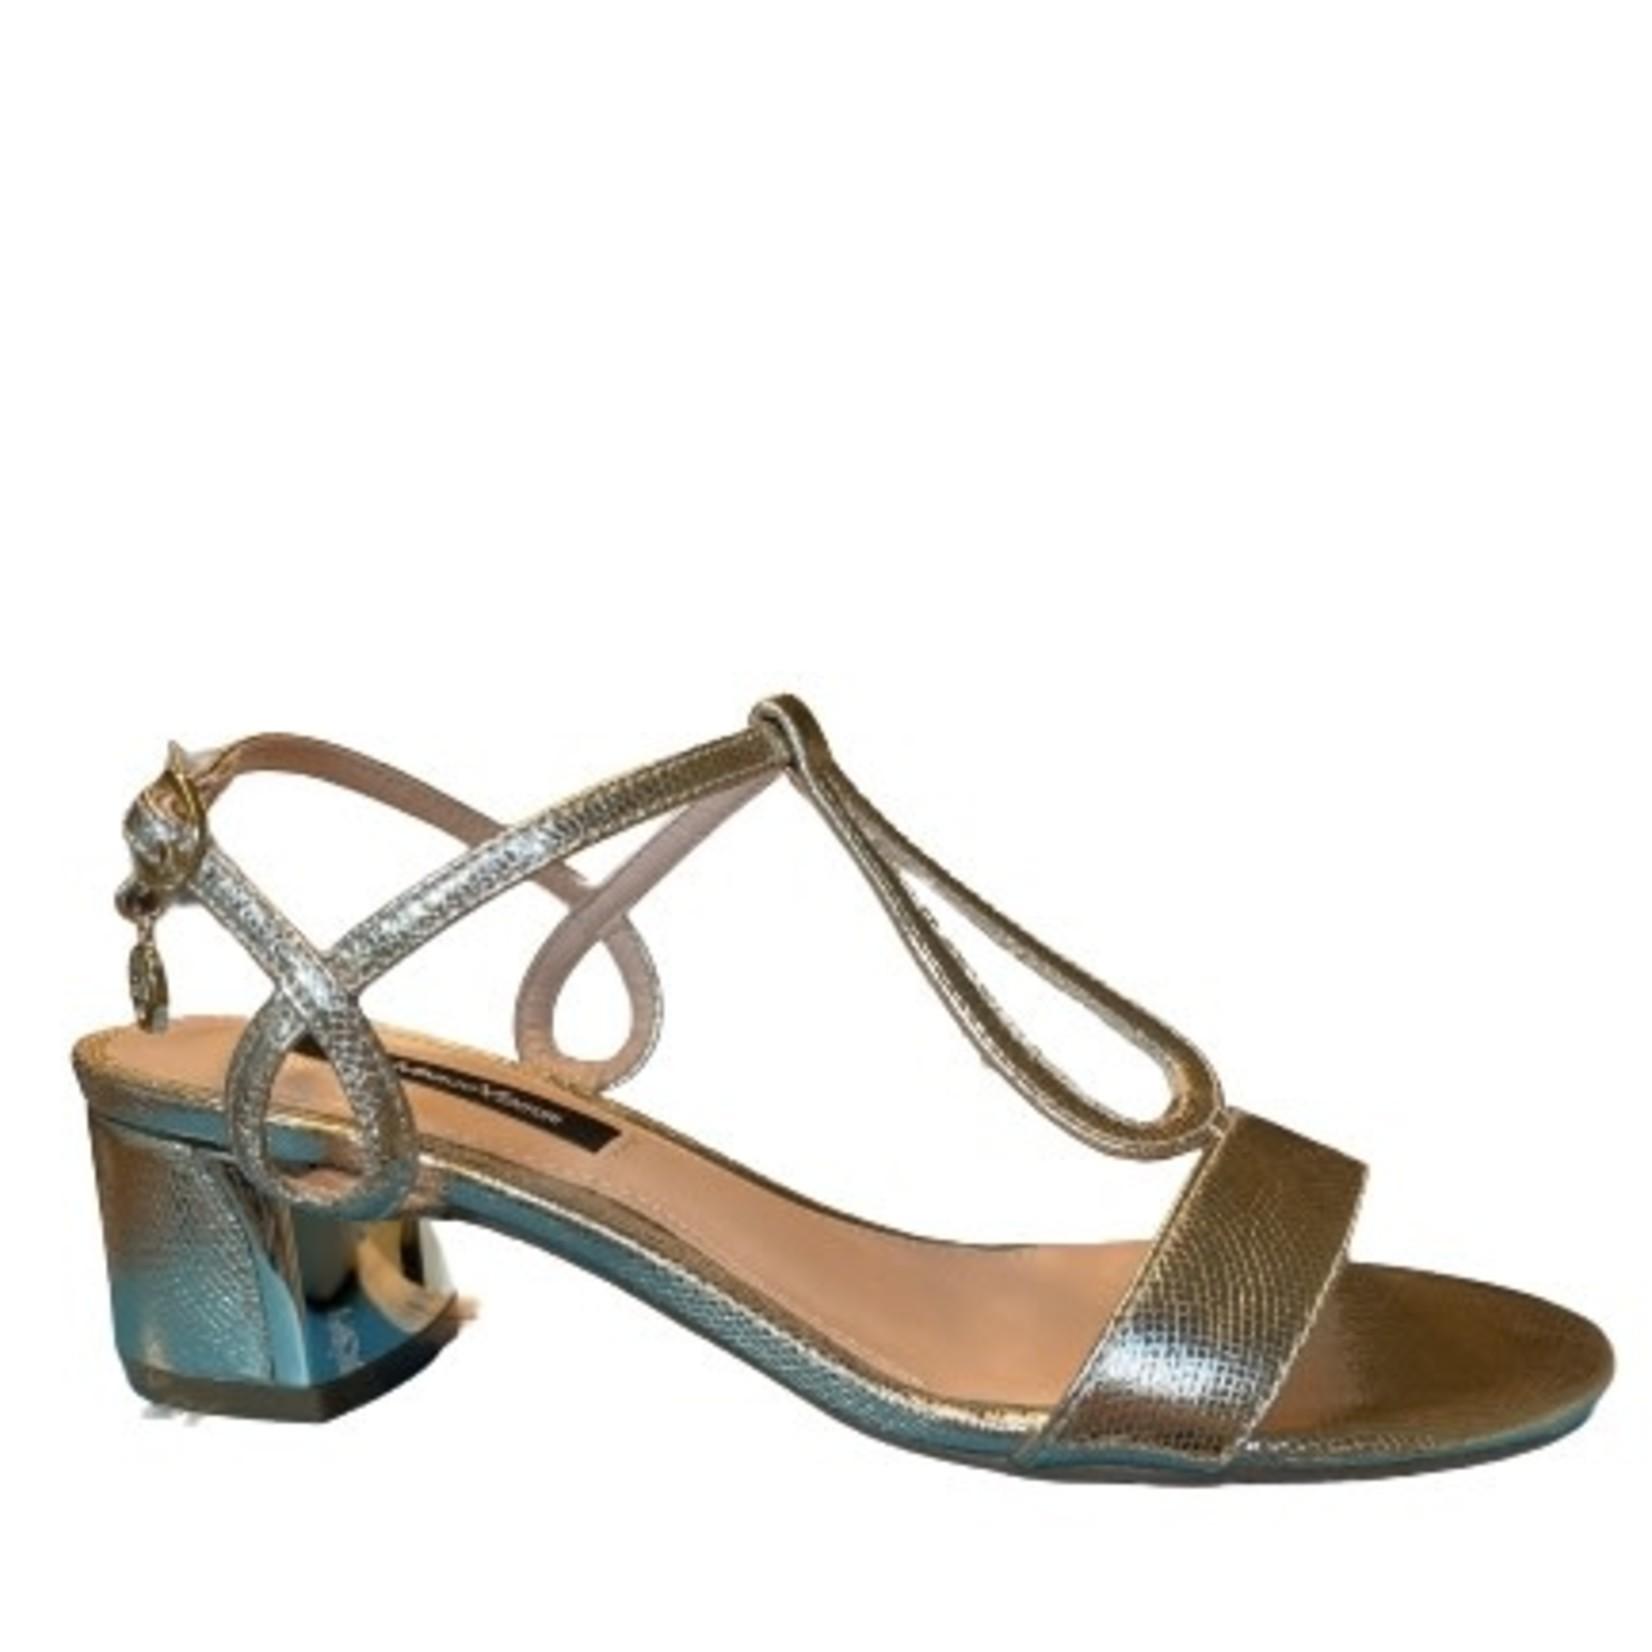 Sandaal hak Goud